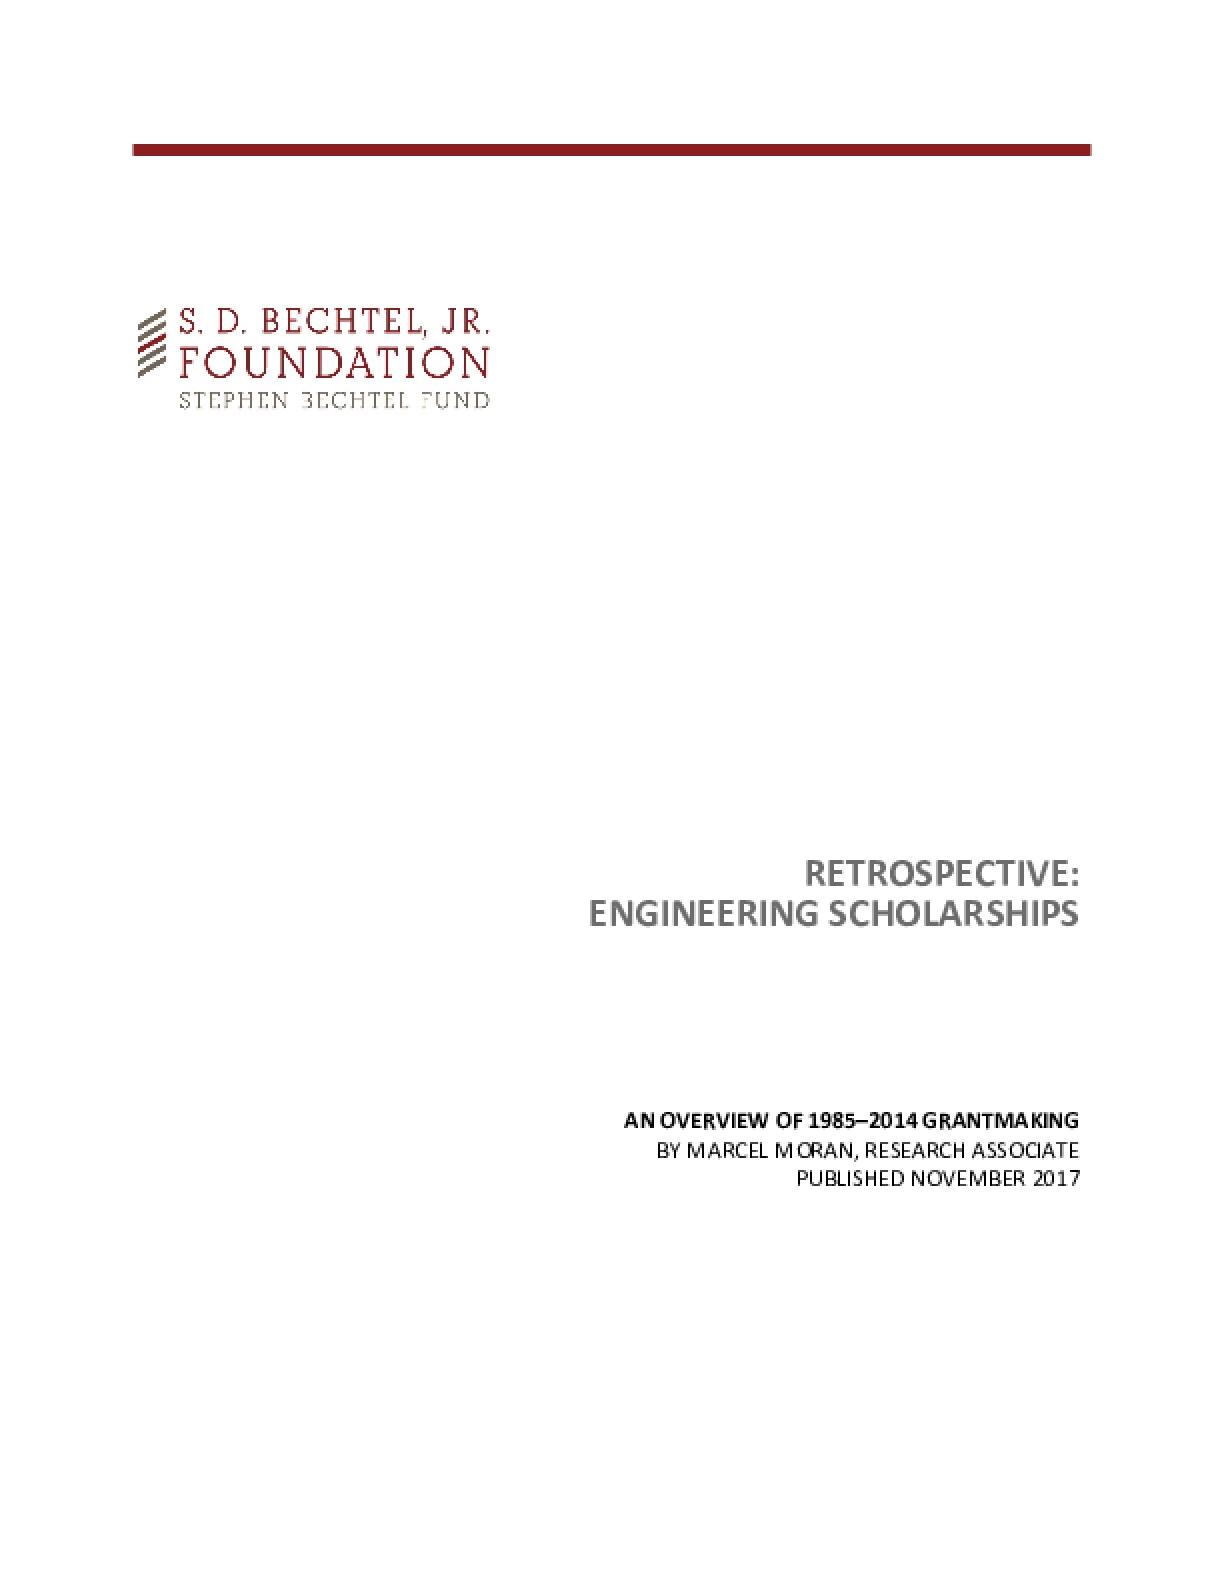 Retrospective: Engineering Scholarships: An Overview of 1985-2014 Grantmaking